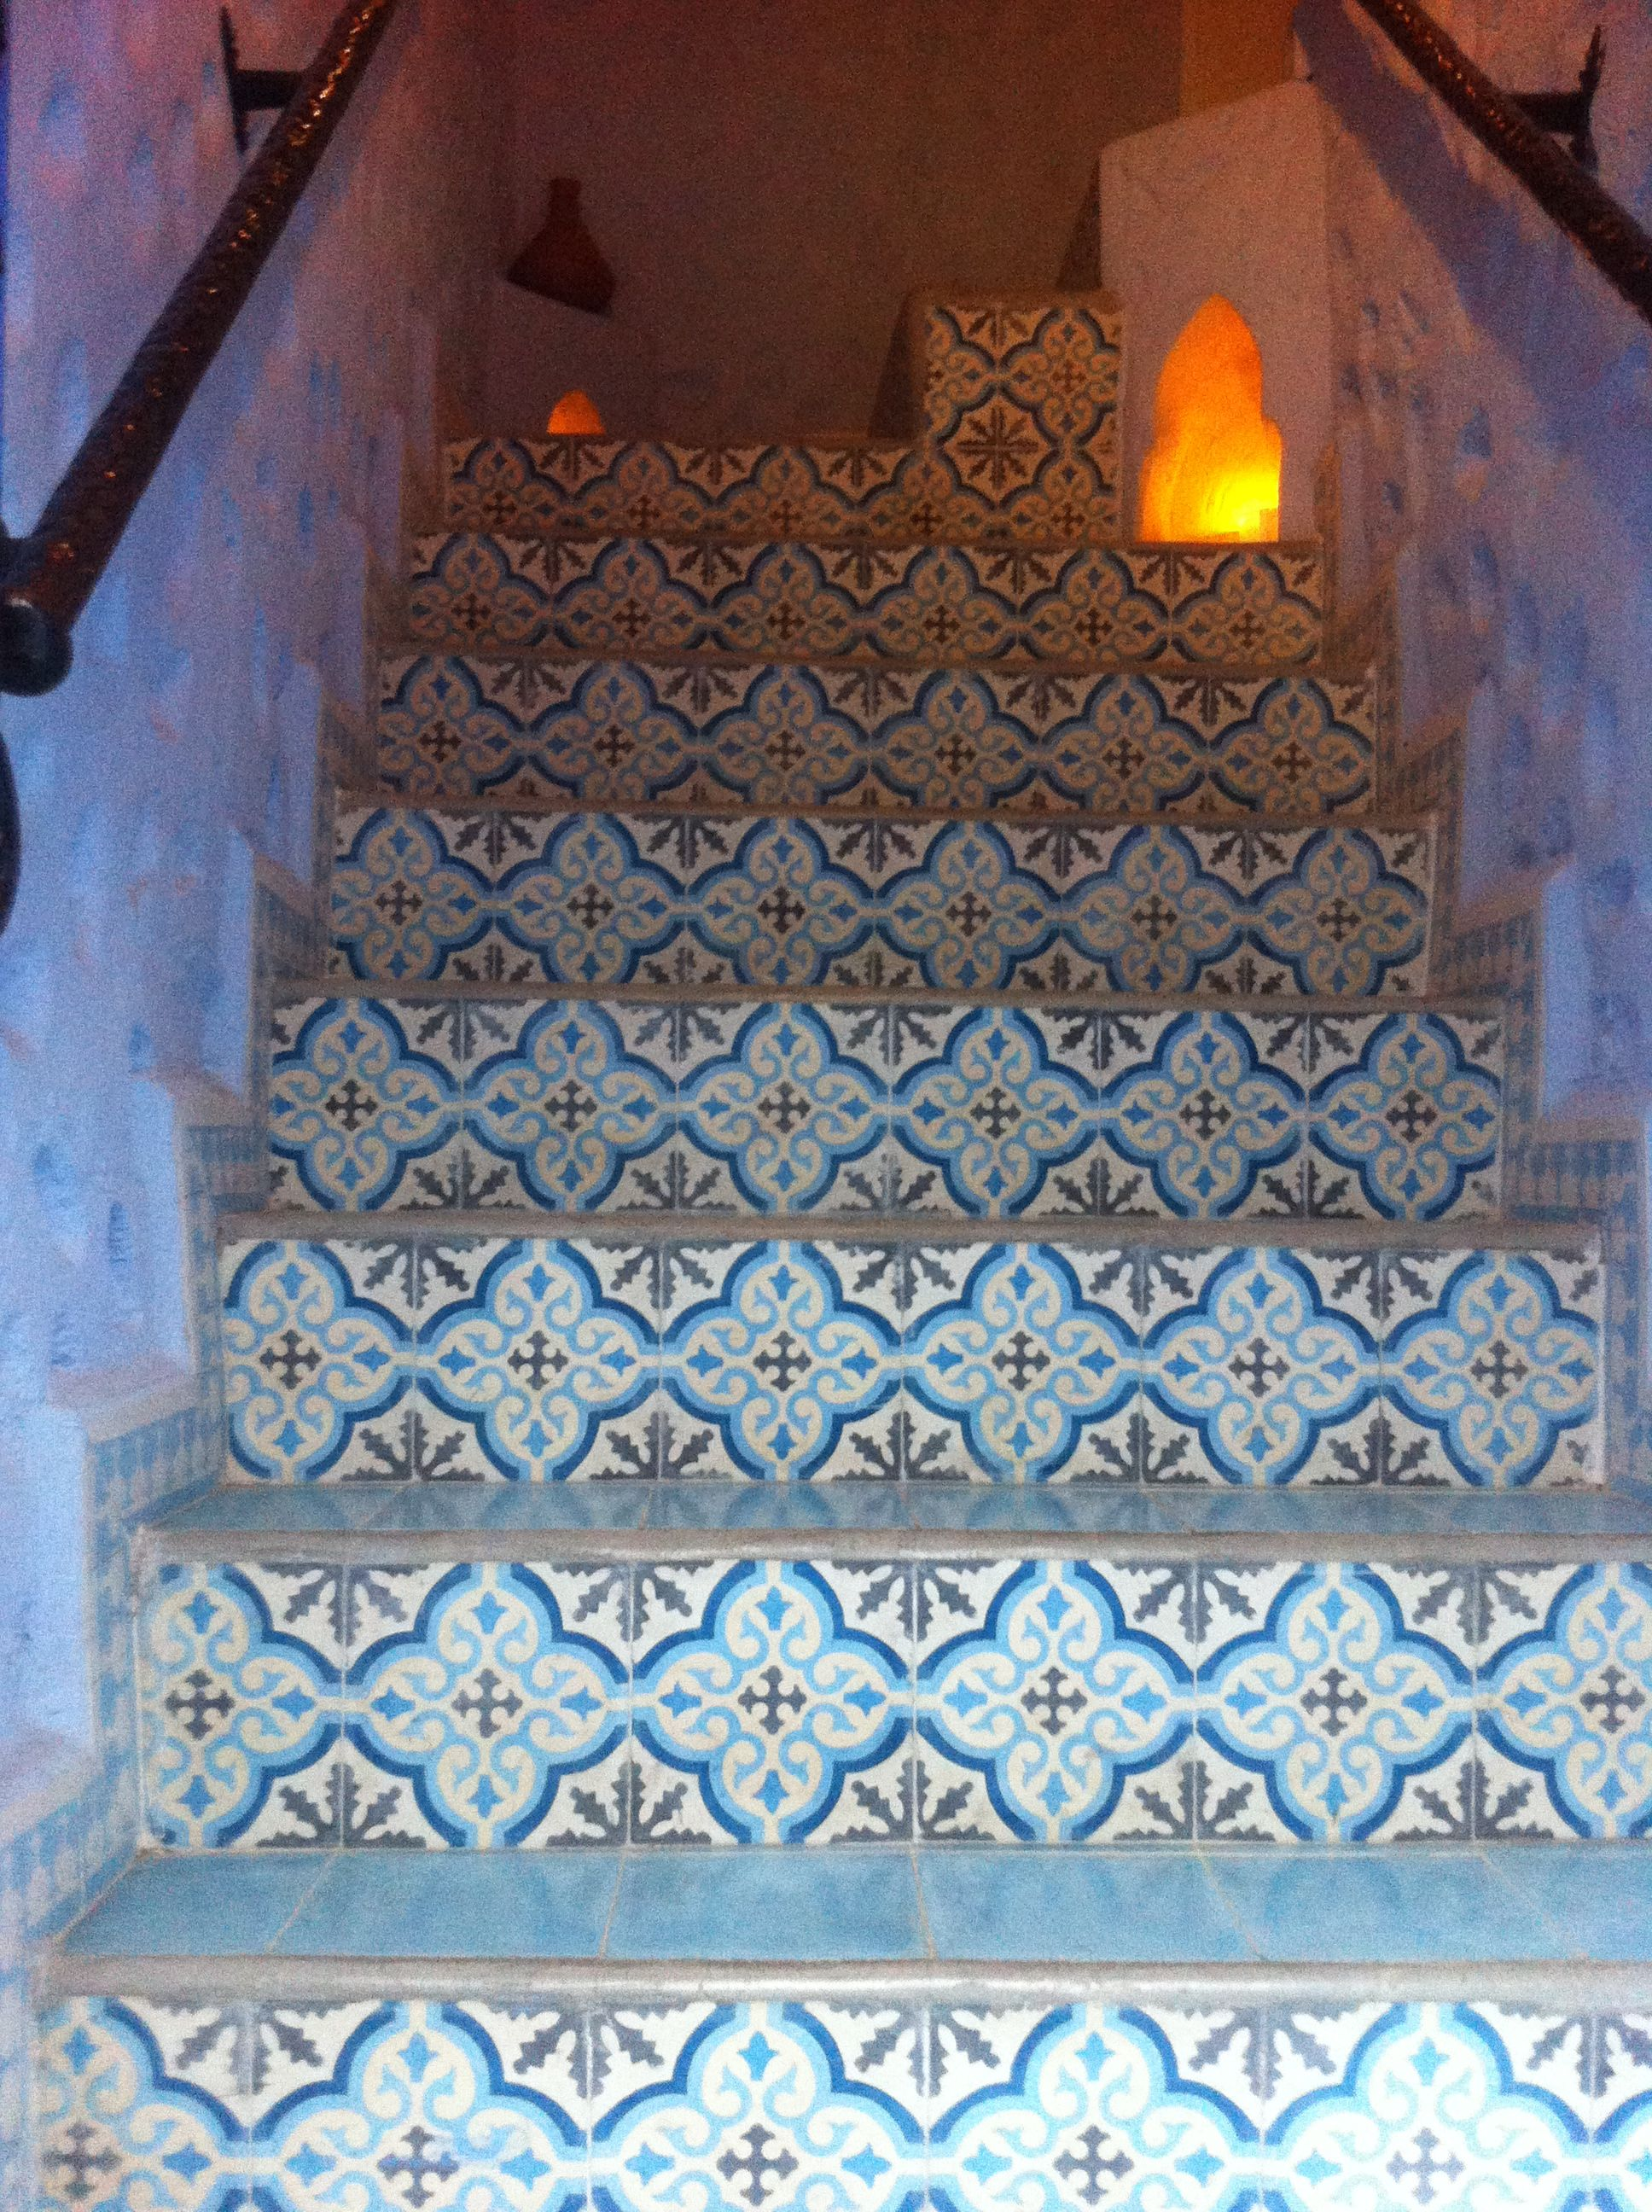 Zementfliesen, Marokko. cement tiles, morocco | Keramik, Porzellan ...